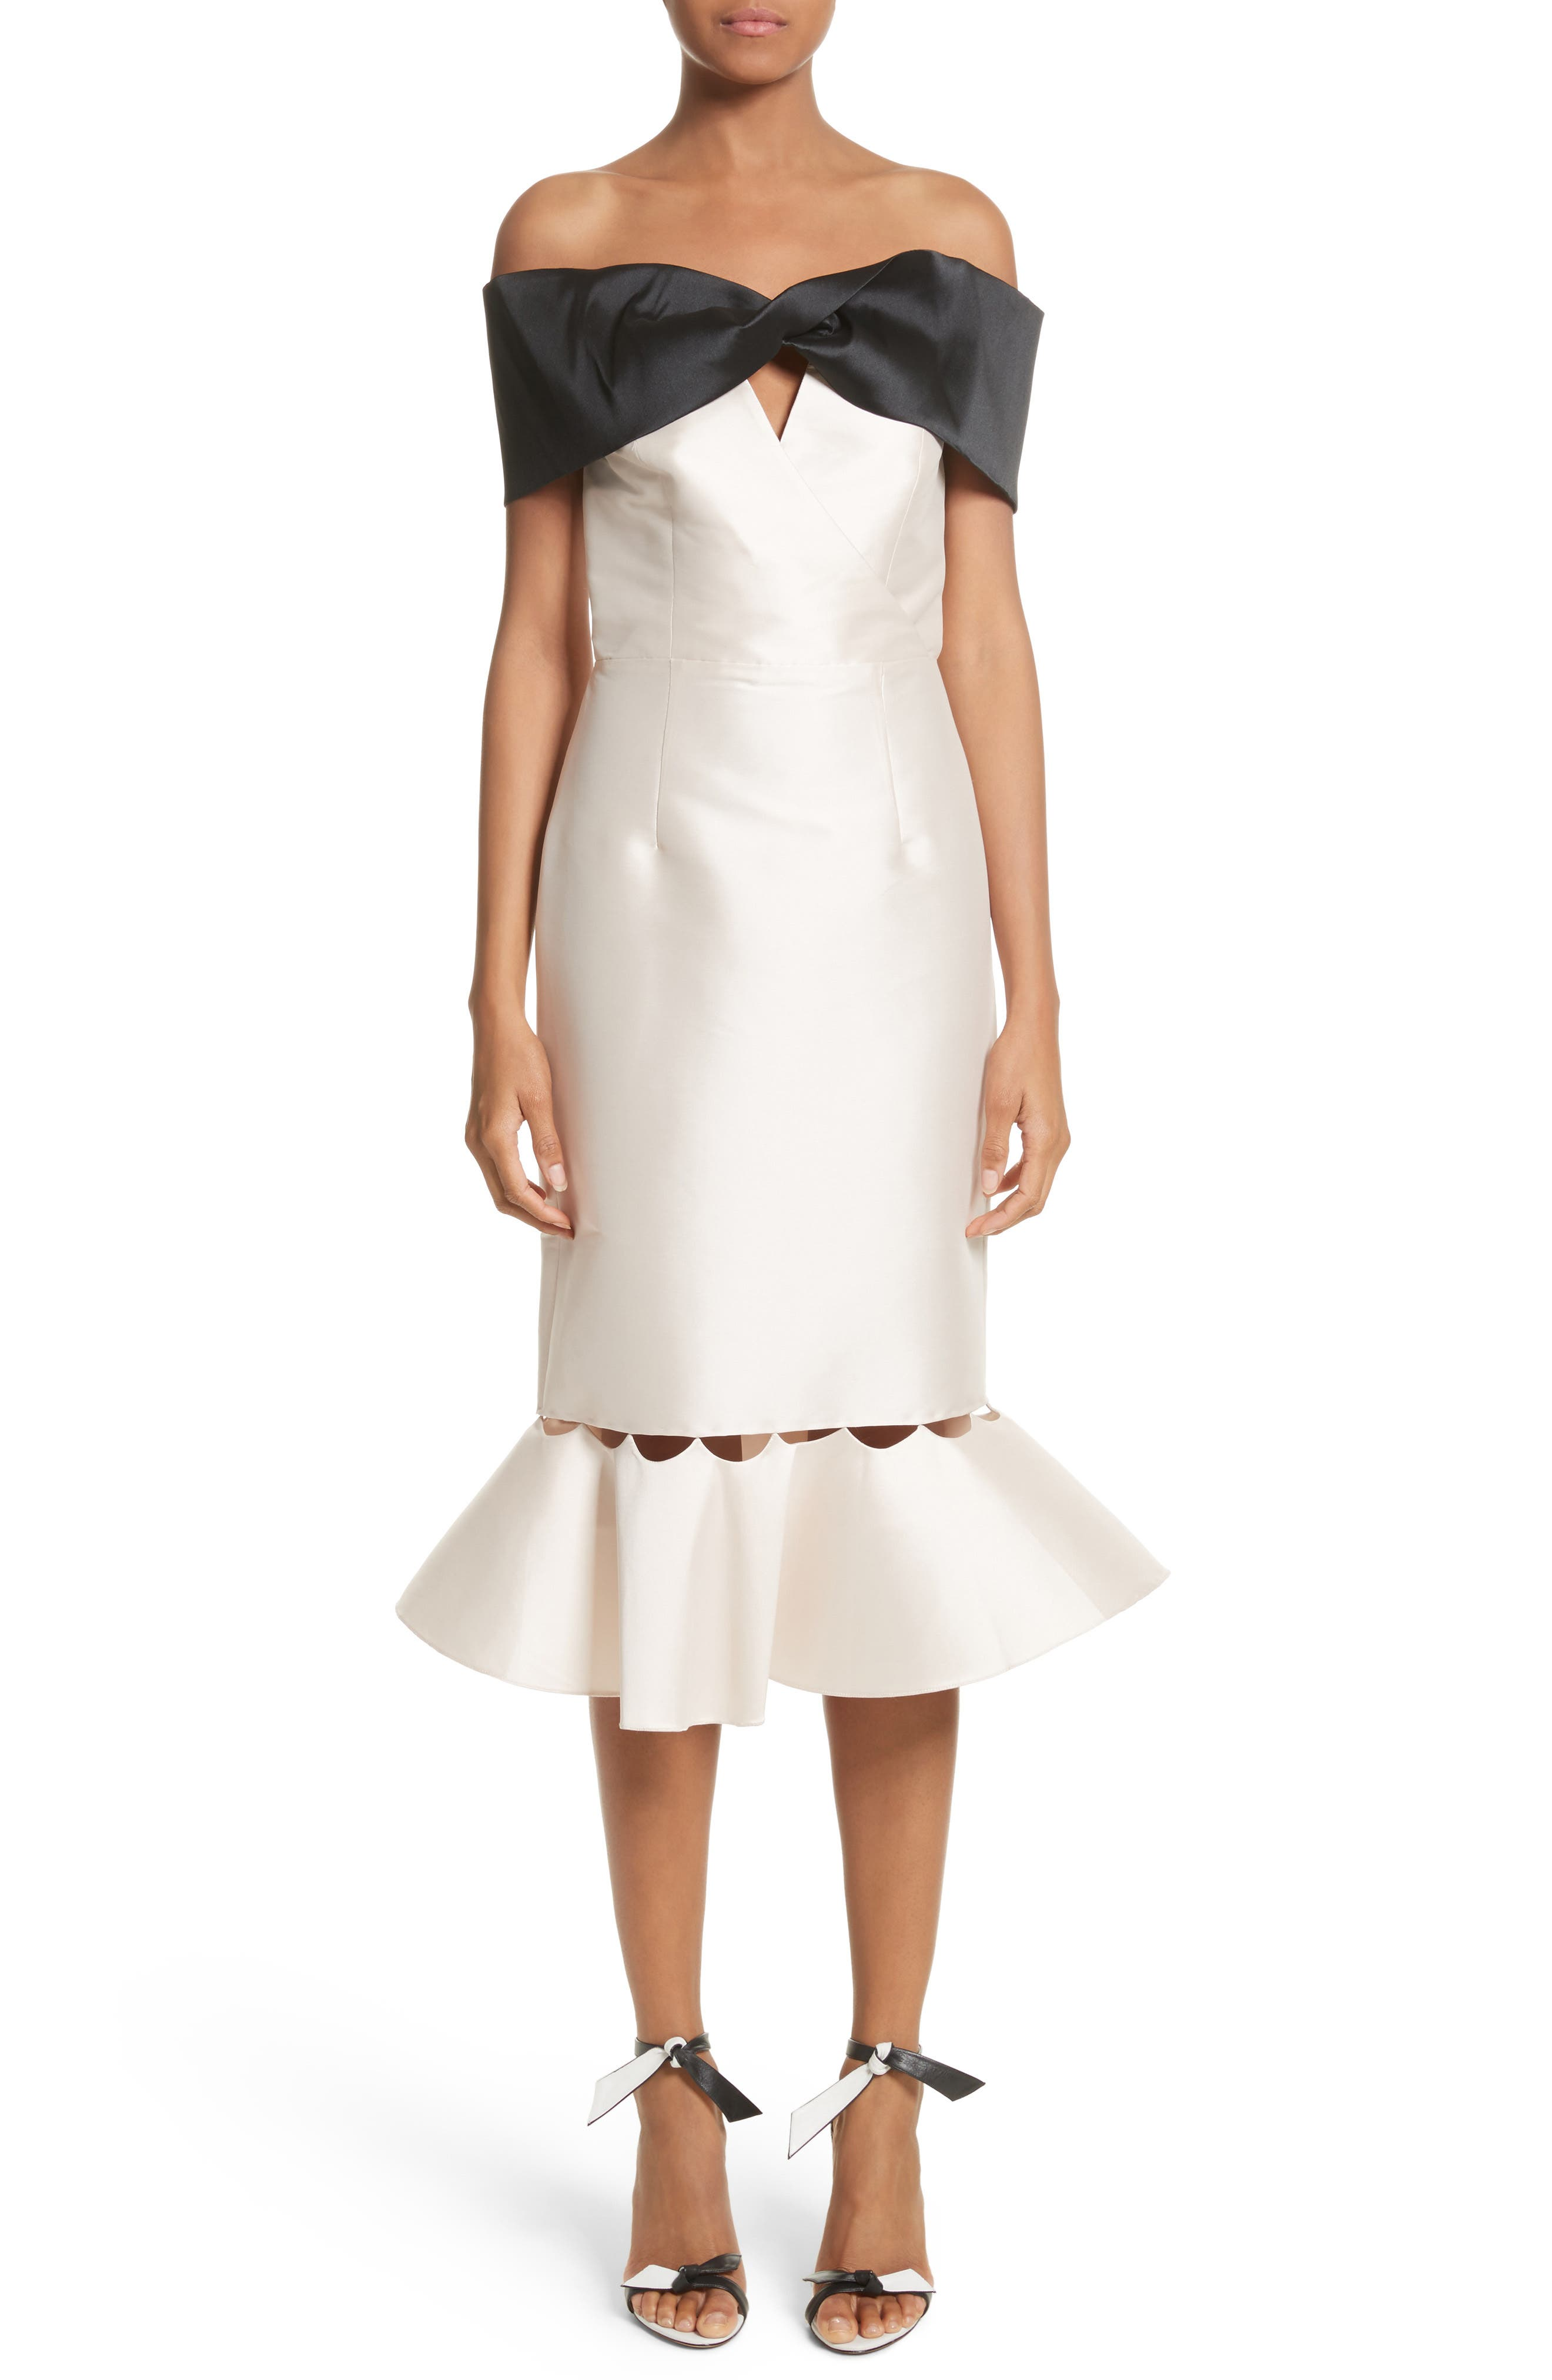 Main Image - Sachin & Babi Noir Asli Colorblock Off the Shoulder Sheath Dress